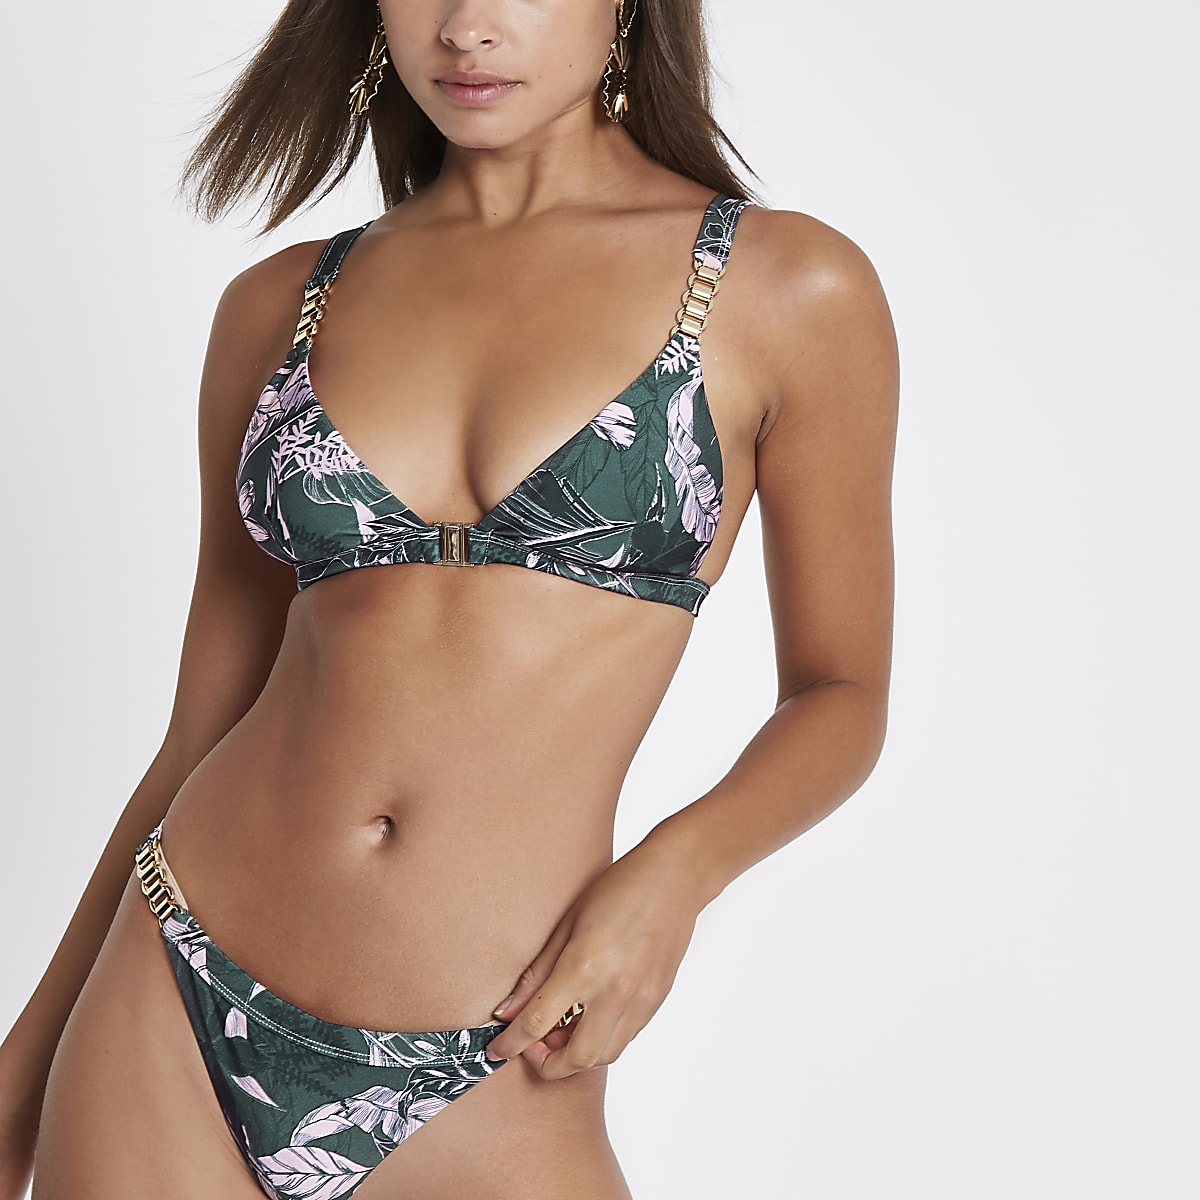 Groene triangel-bikinitop met bloemenprint en ketting